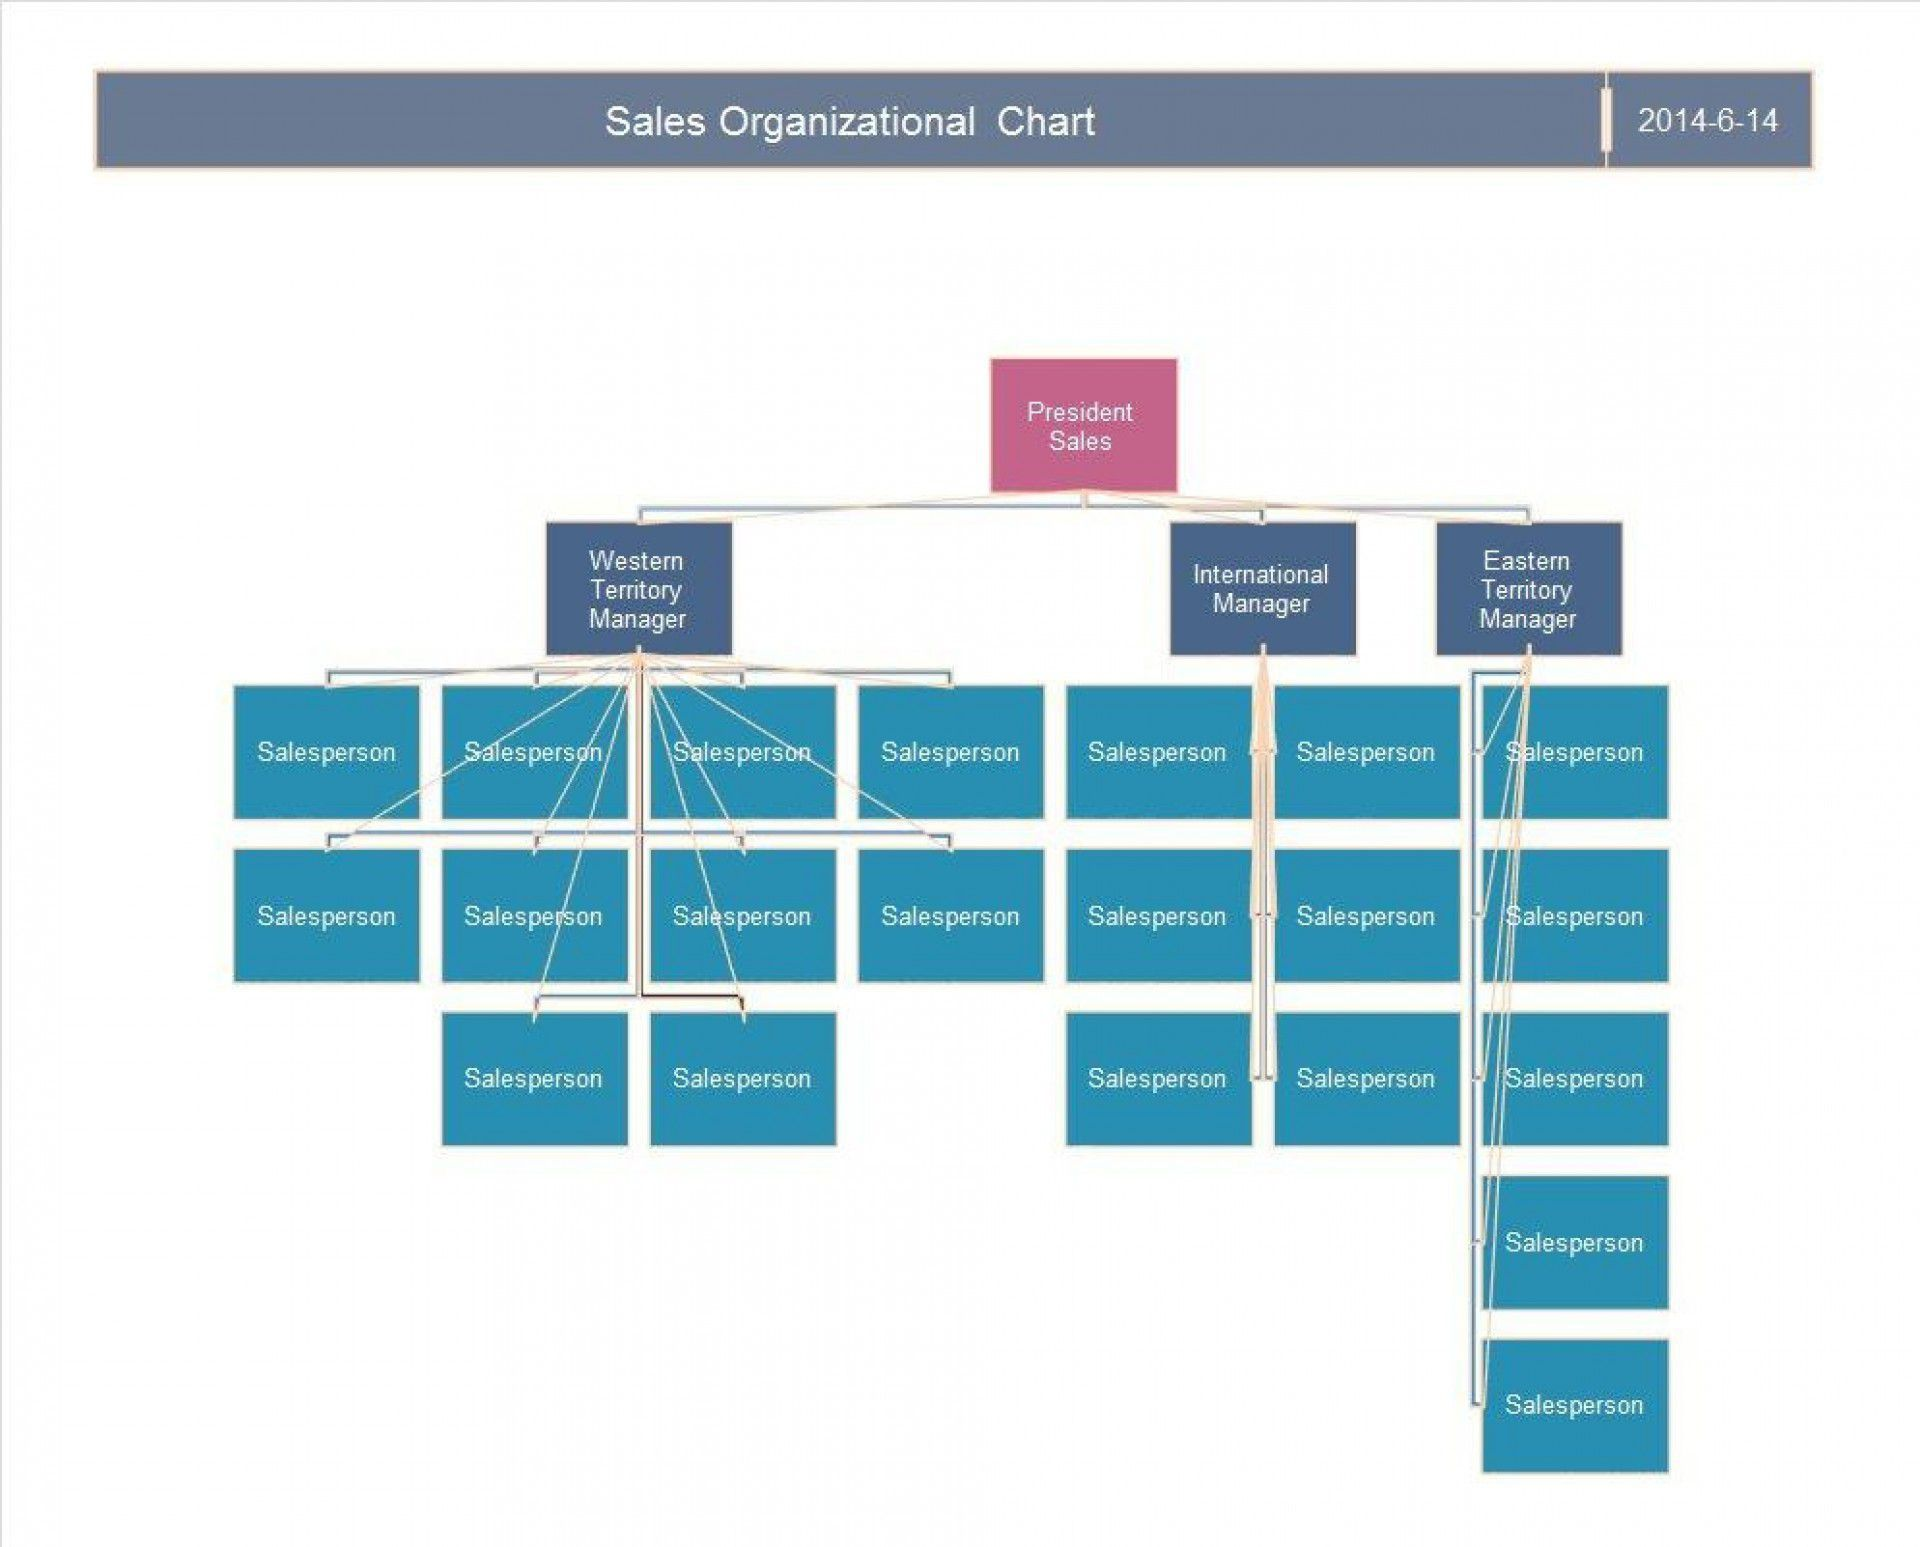 005 Striking Organization Chart Template Word 2013 Design  Organizational Free MicrosoftFull